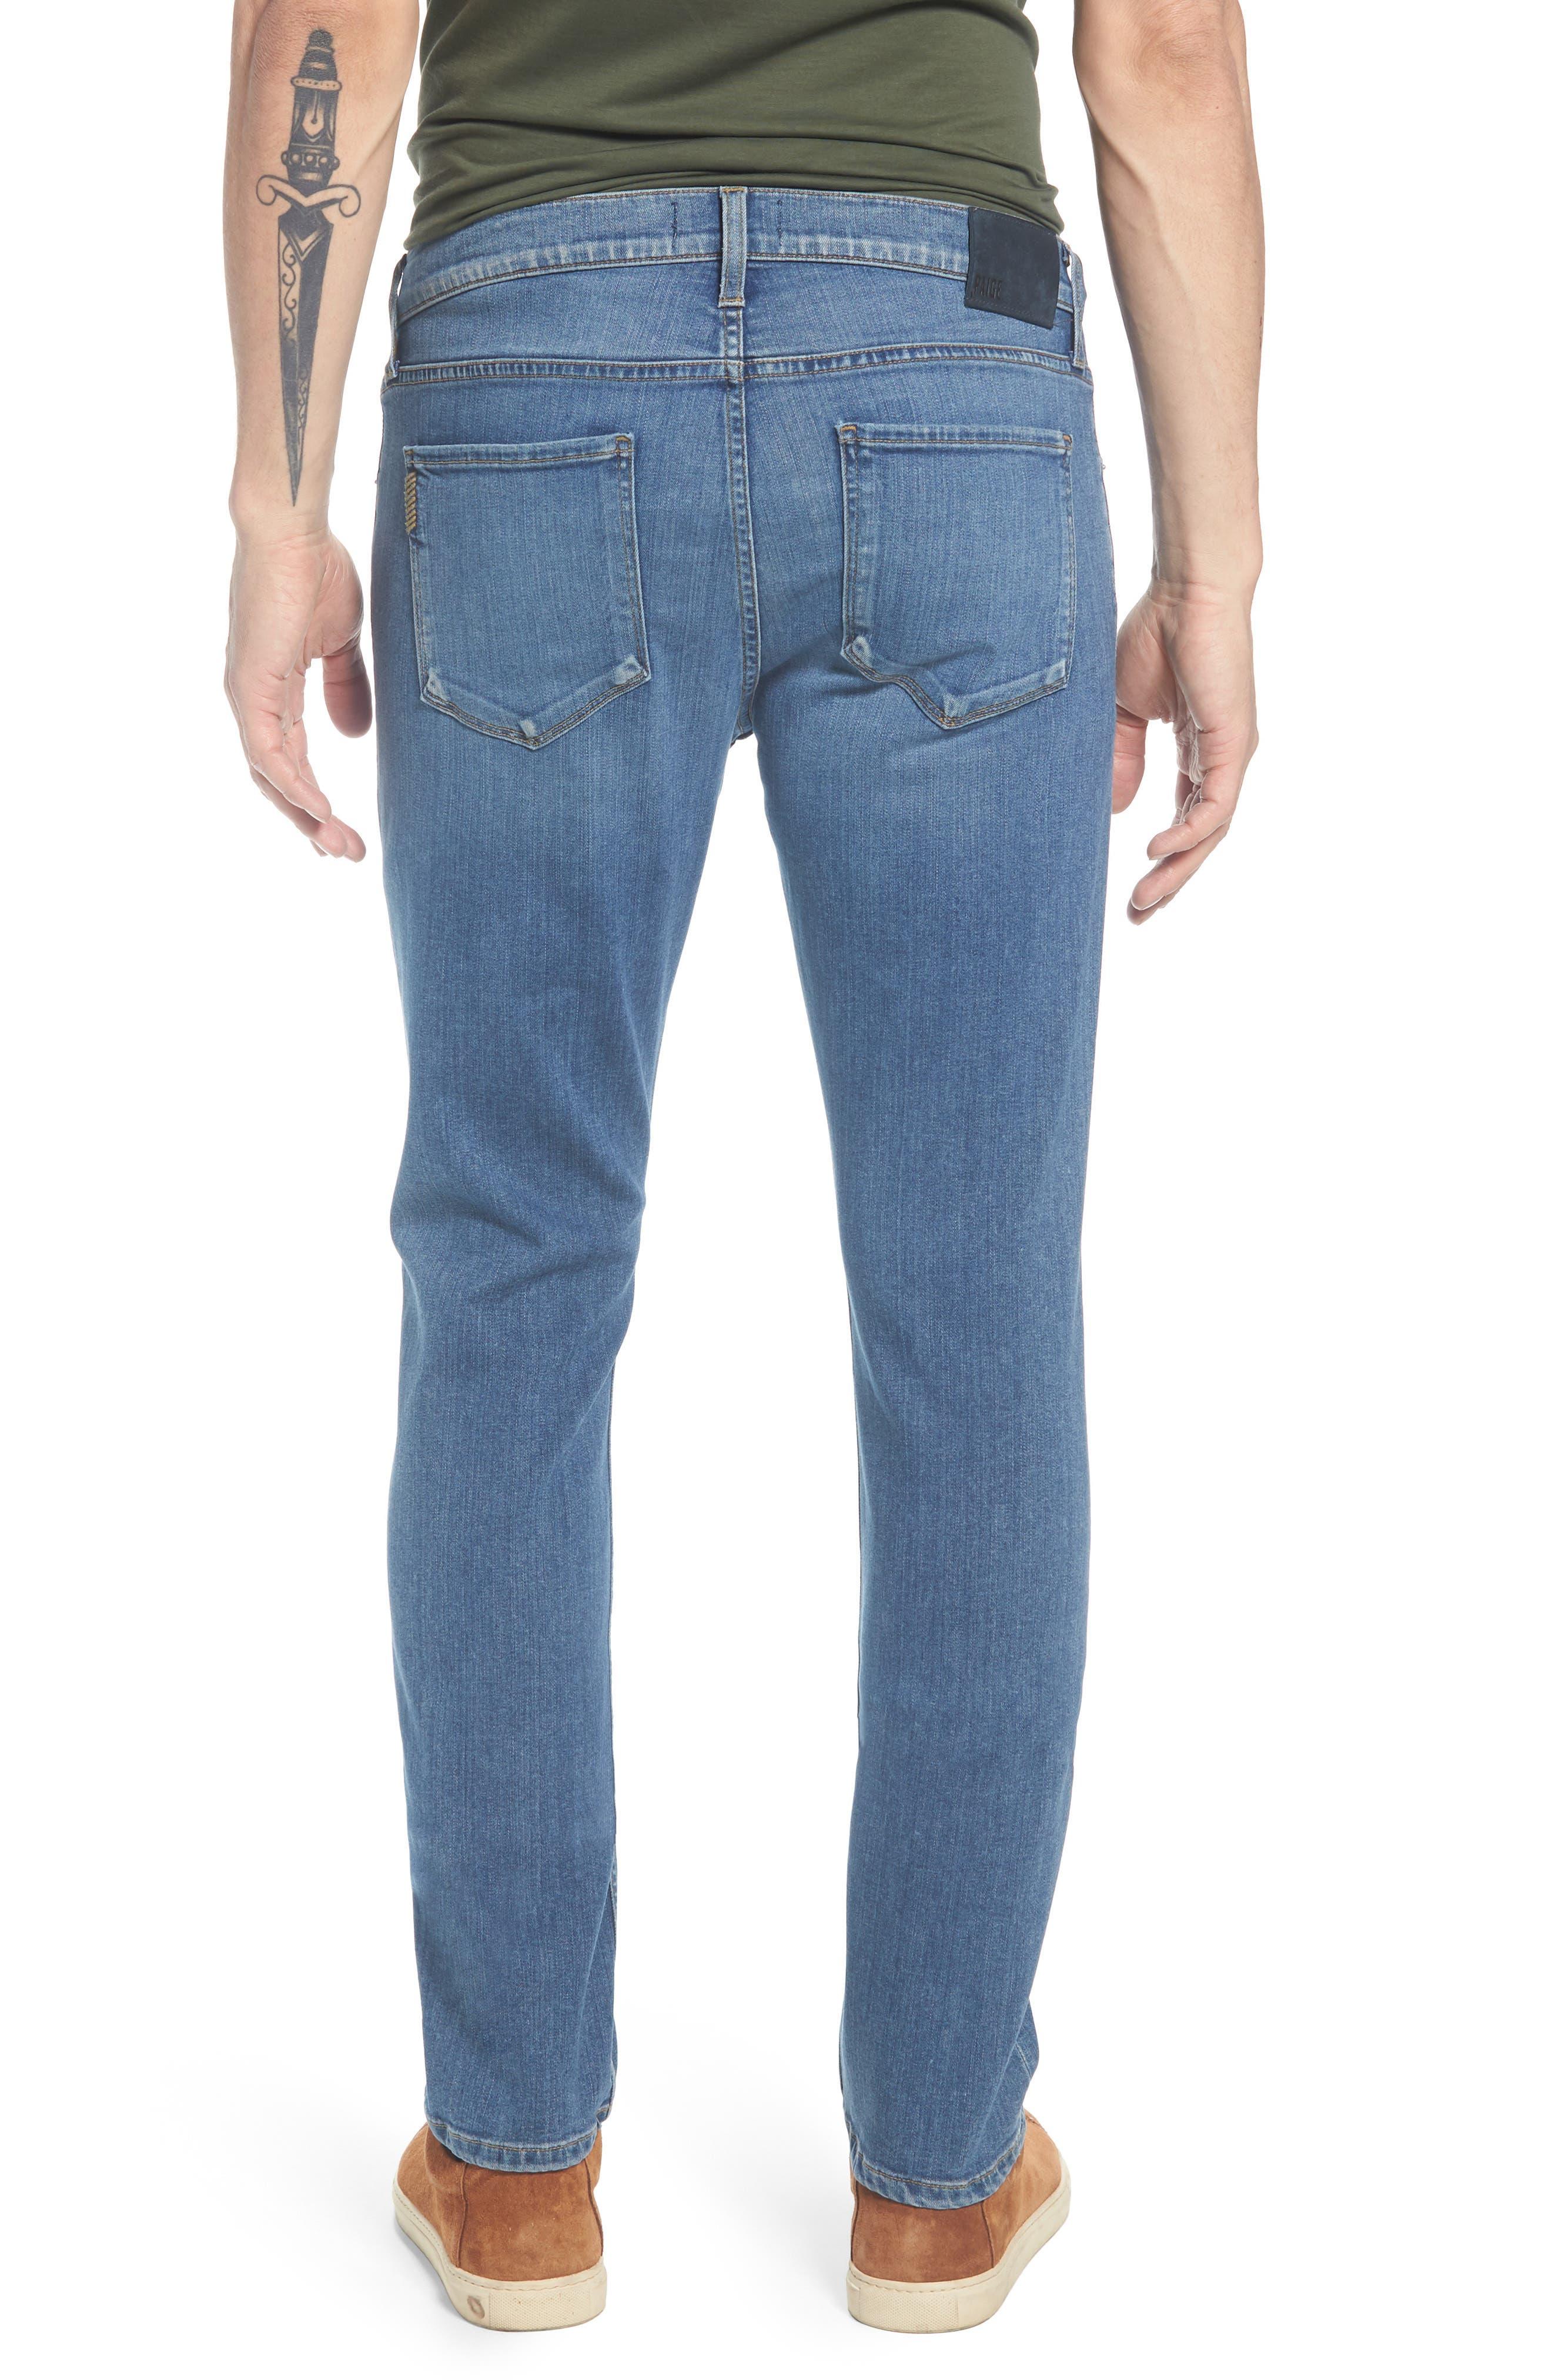 Transcend - Federal Slim Straight Leg Jeans,                             Alternate thumbnail 2, color,                             Caine